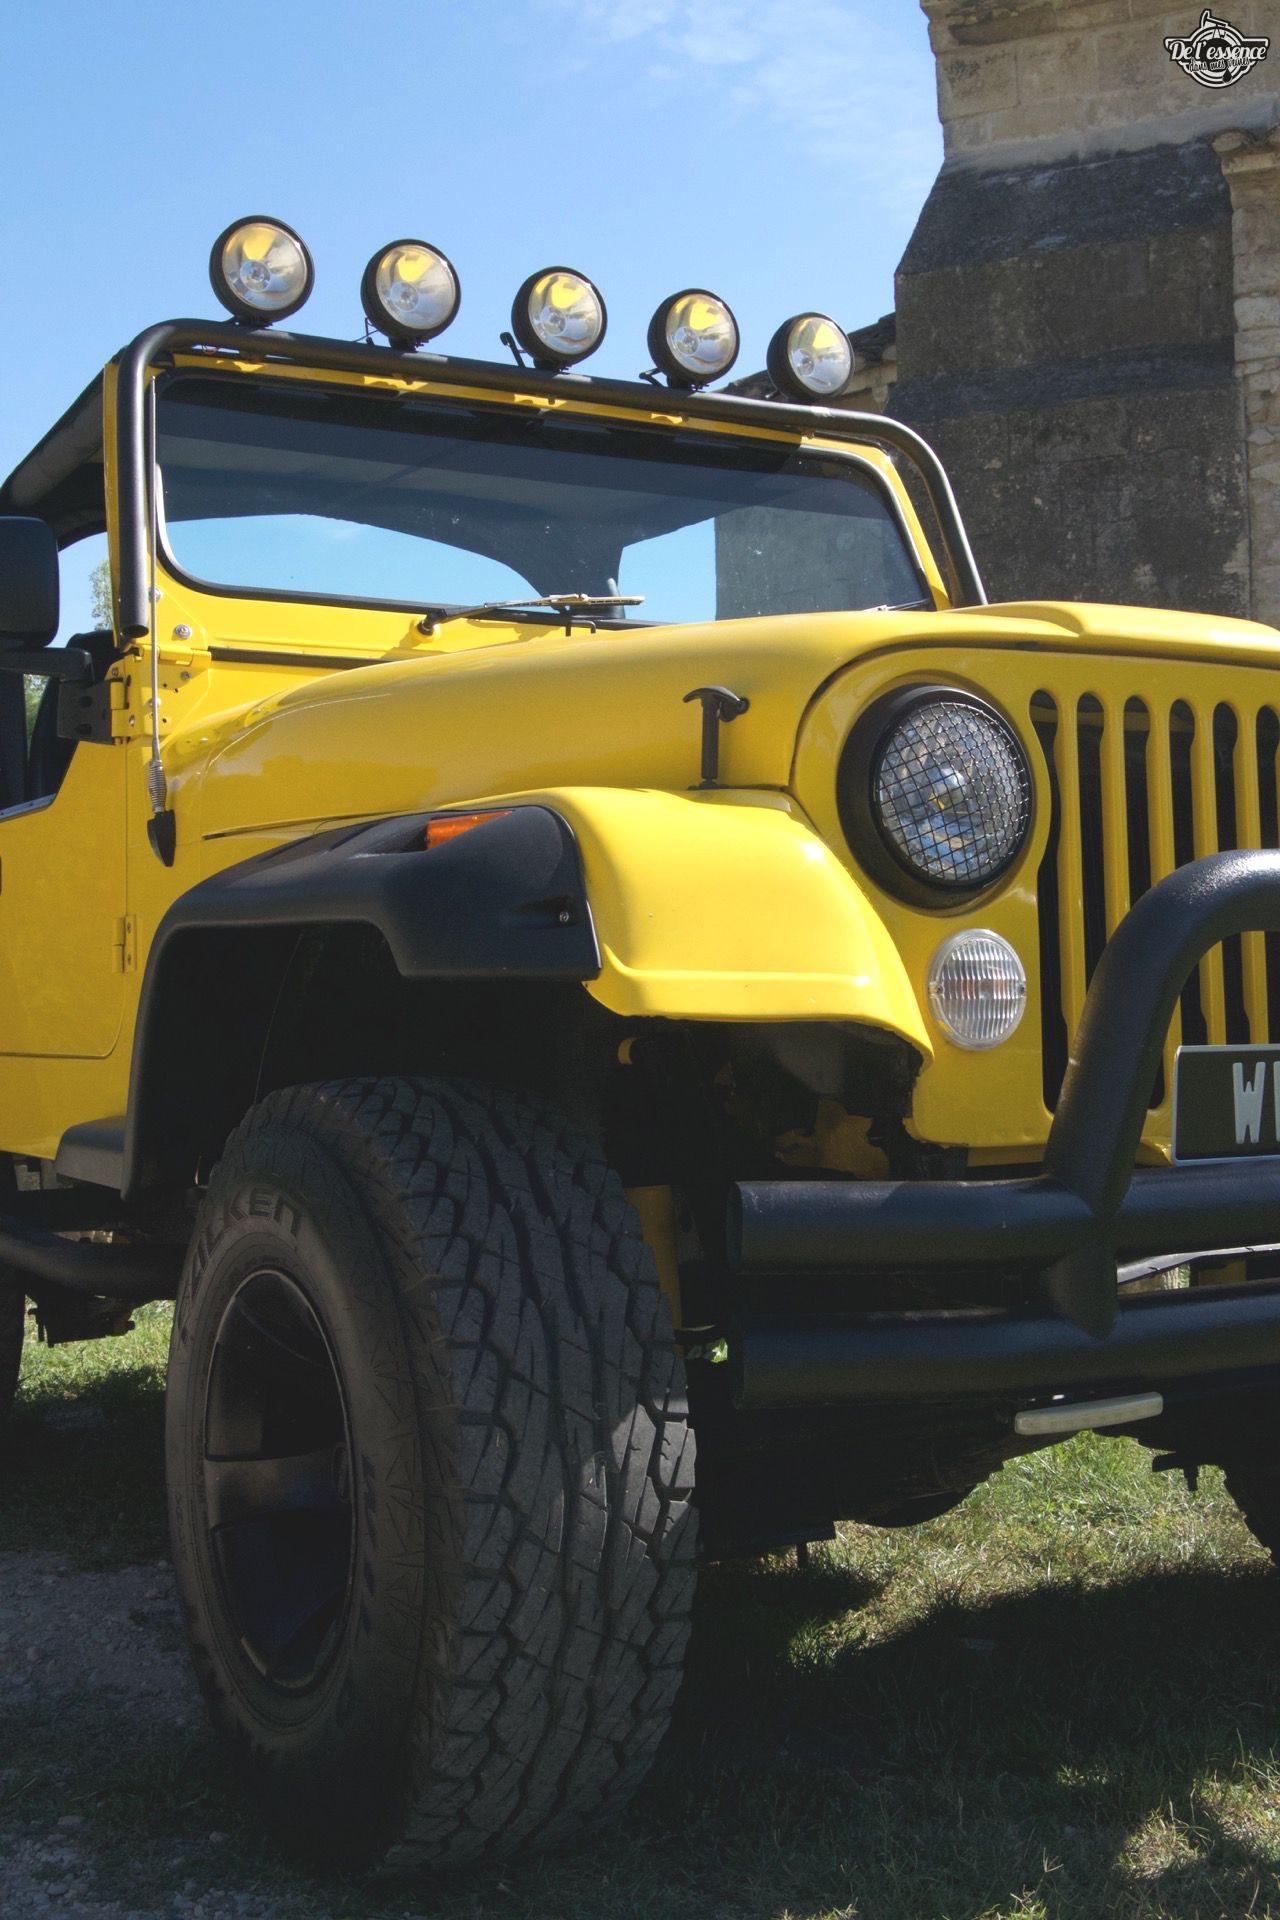 '82 Jeep CJ-7 Laredo - Quand tu te fais chier sur la route... 64